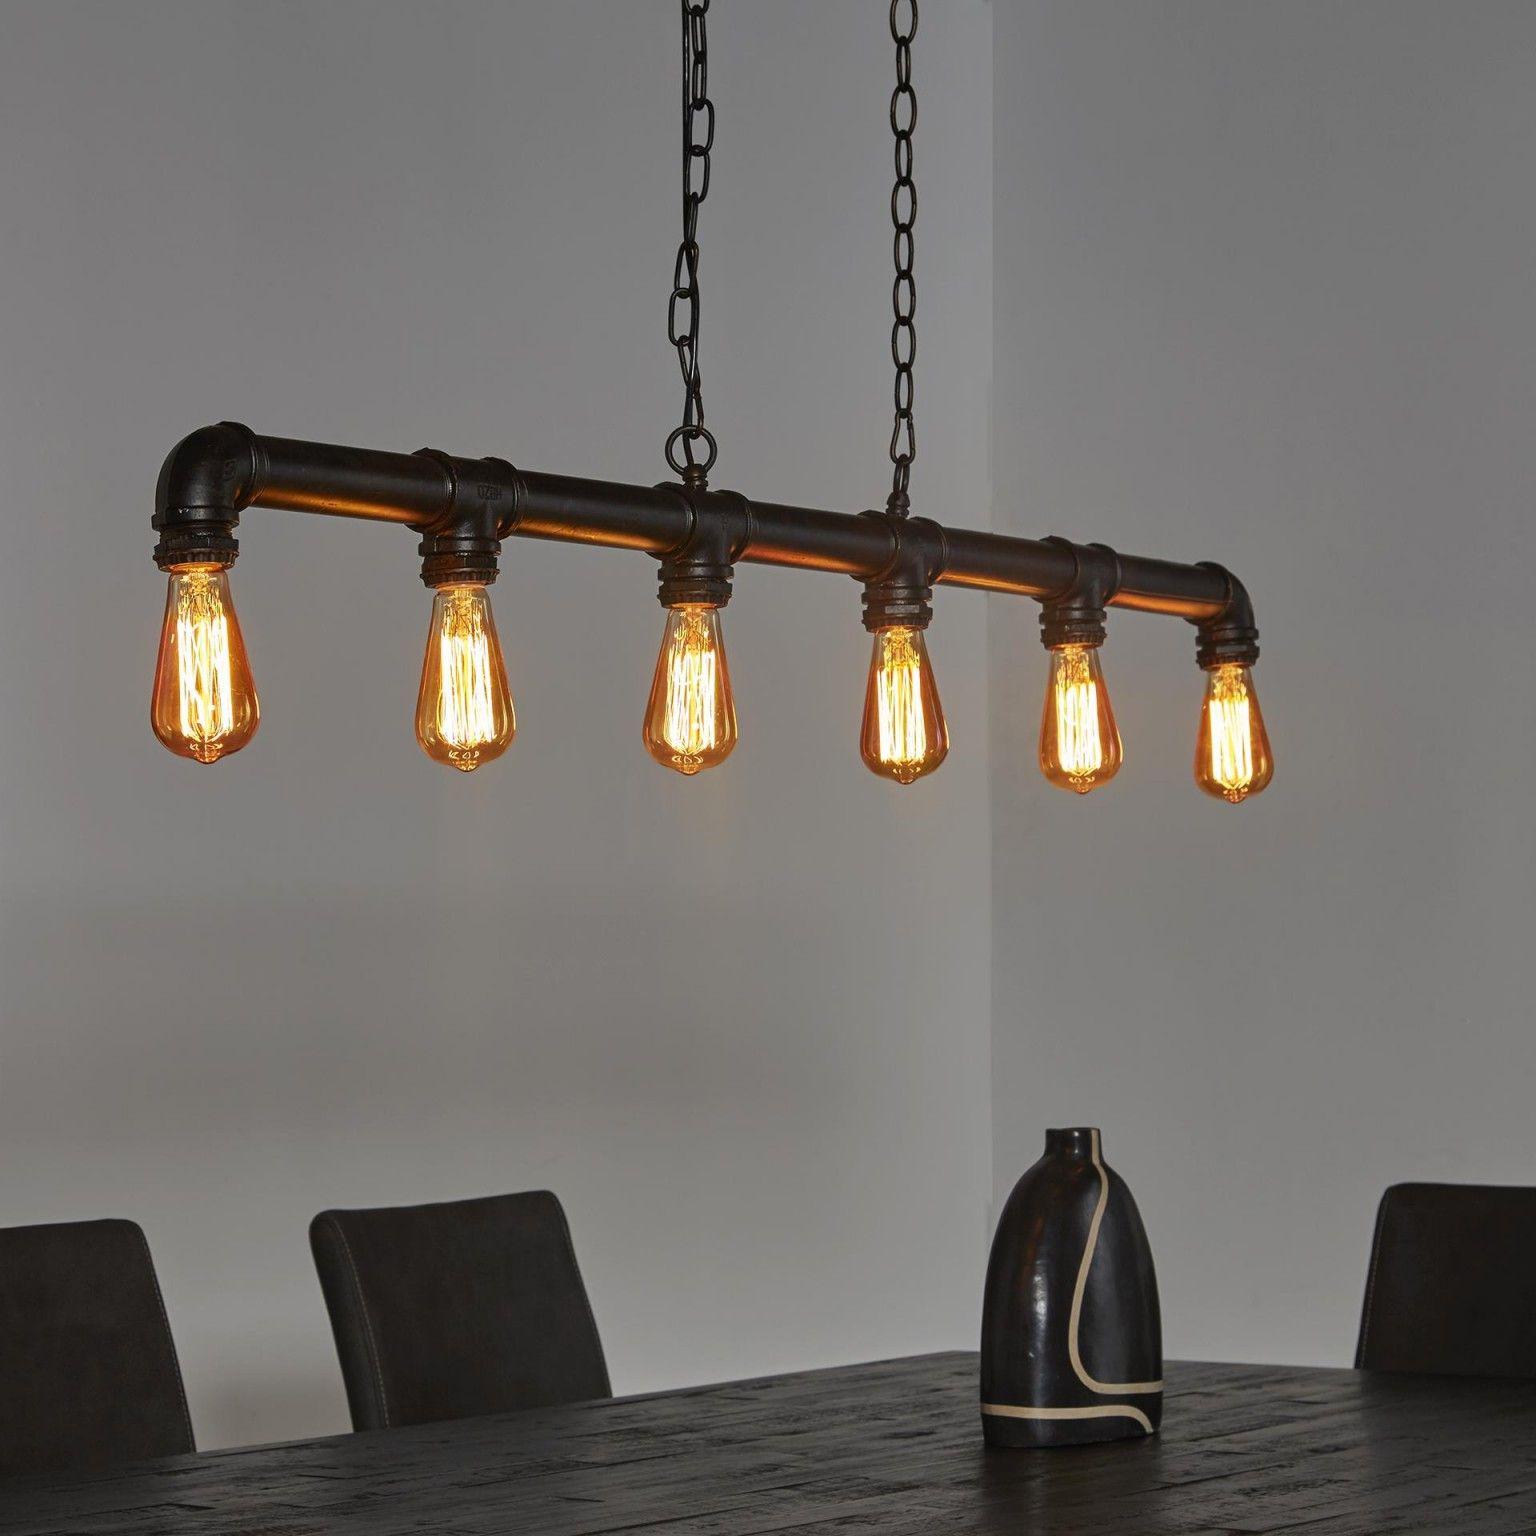 Industriële Hanglamp \'Brock\' 6-lamps | Woon-eetkamer | Pinterest